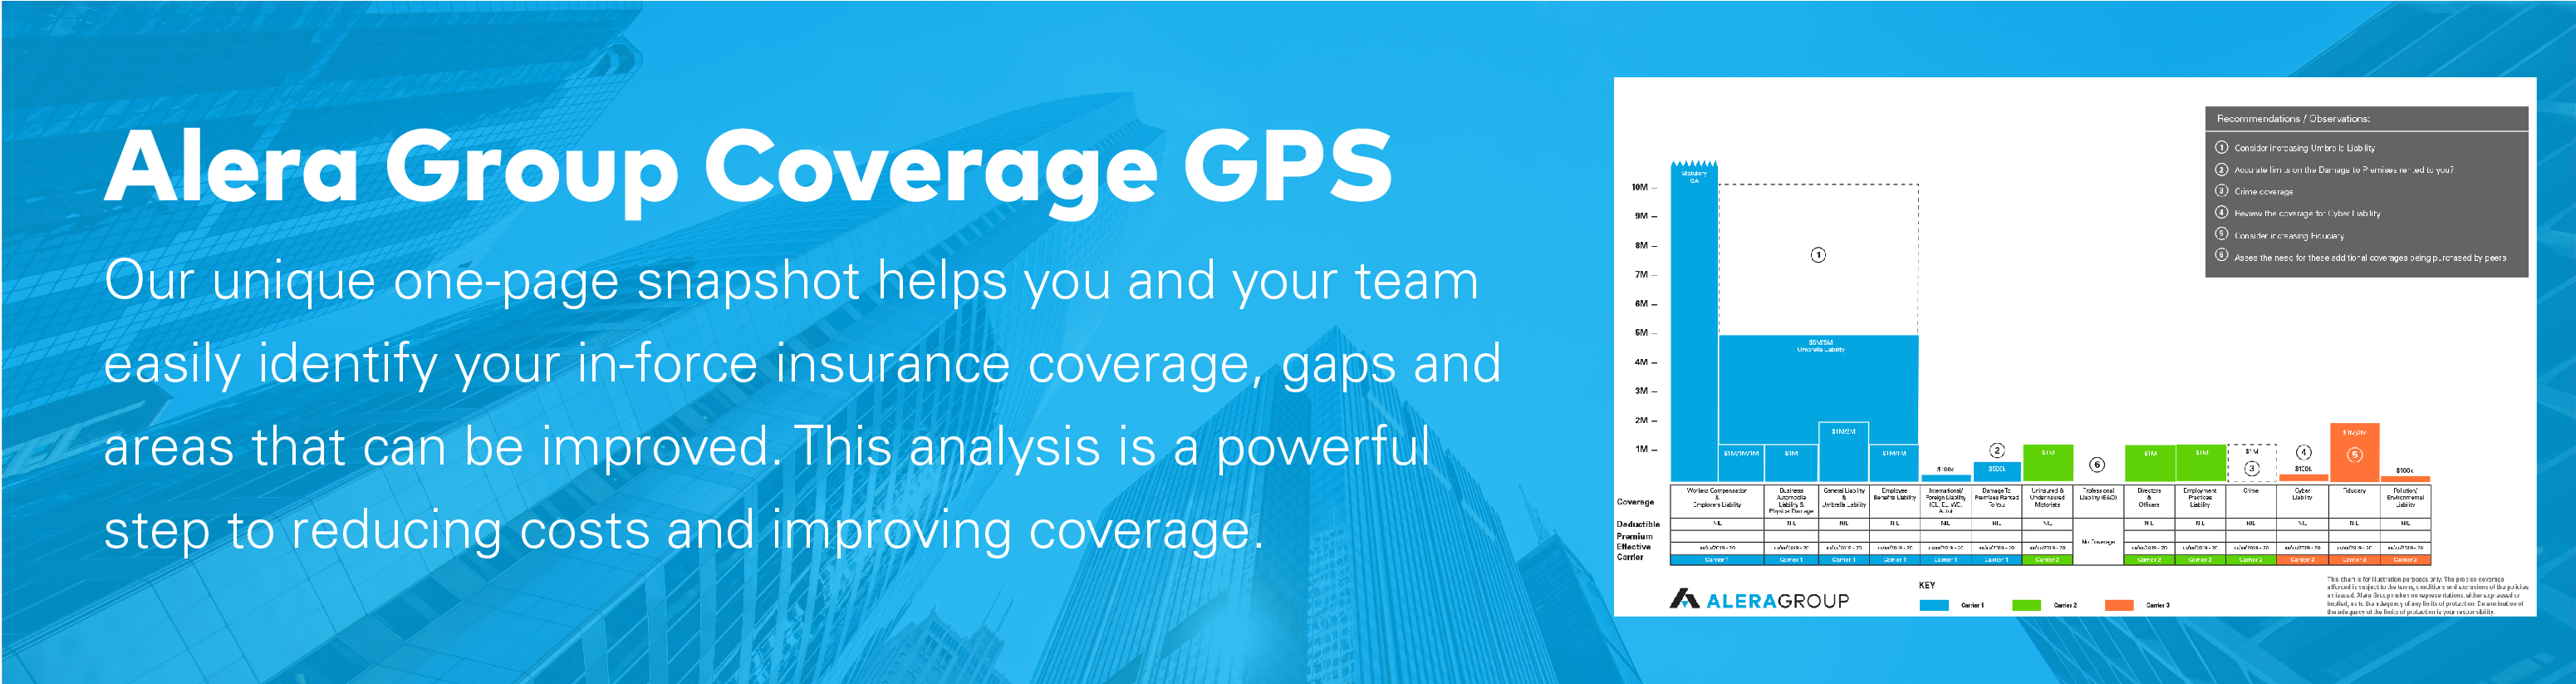 alera group coverage GPS